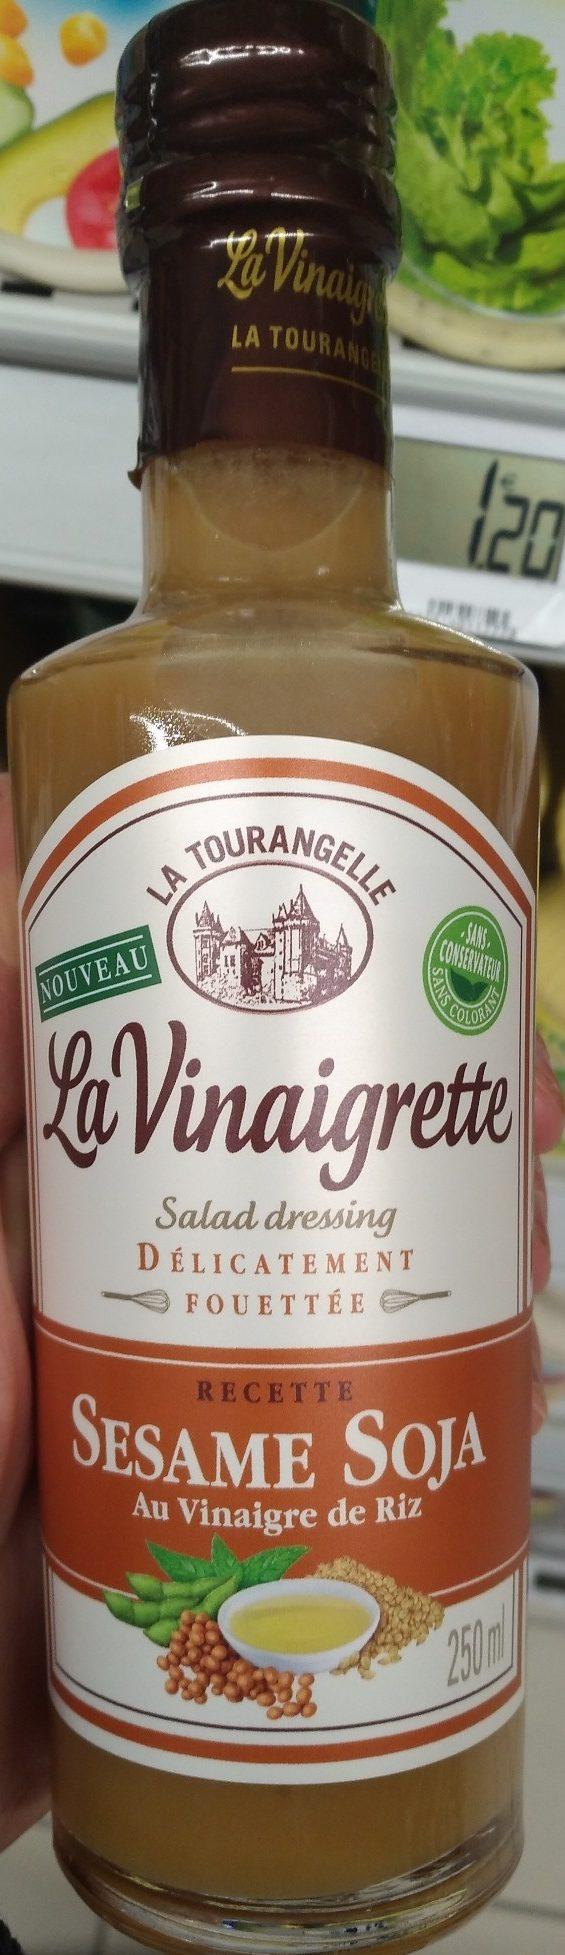 La Vinaigrette sesame soja - Product